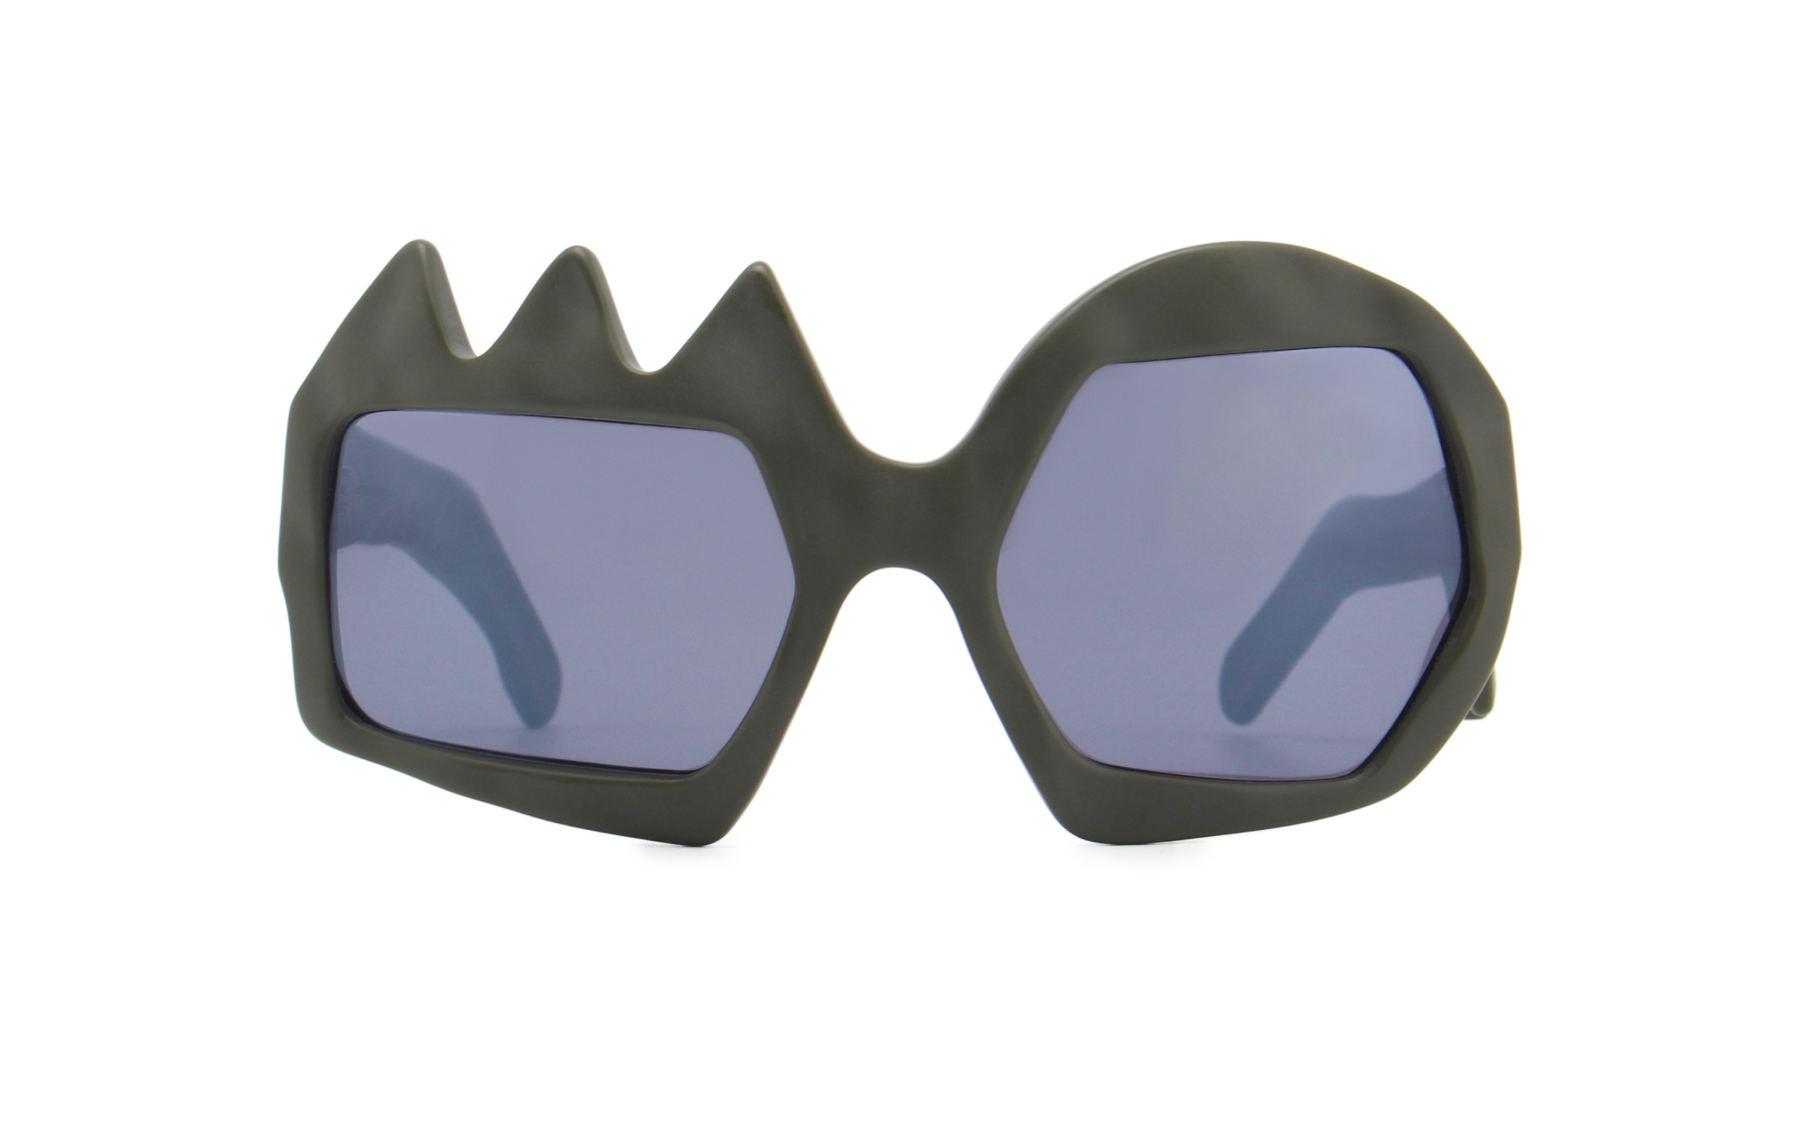 FAKBYFAK x Walter Van Beirendonck  Lightning Sunglasses. Military Green Code: FBF-09-11-04